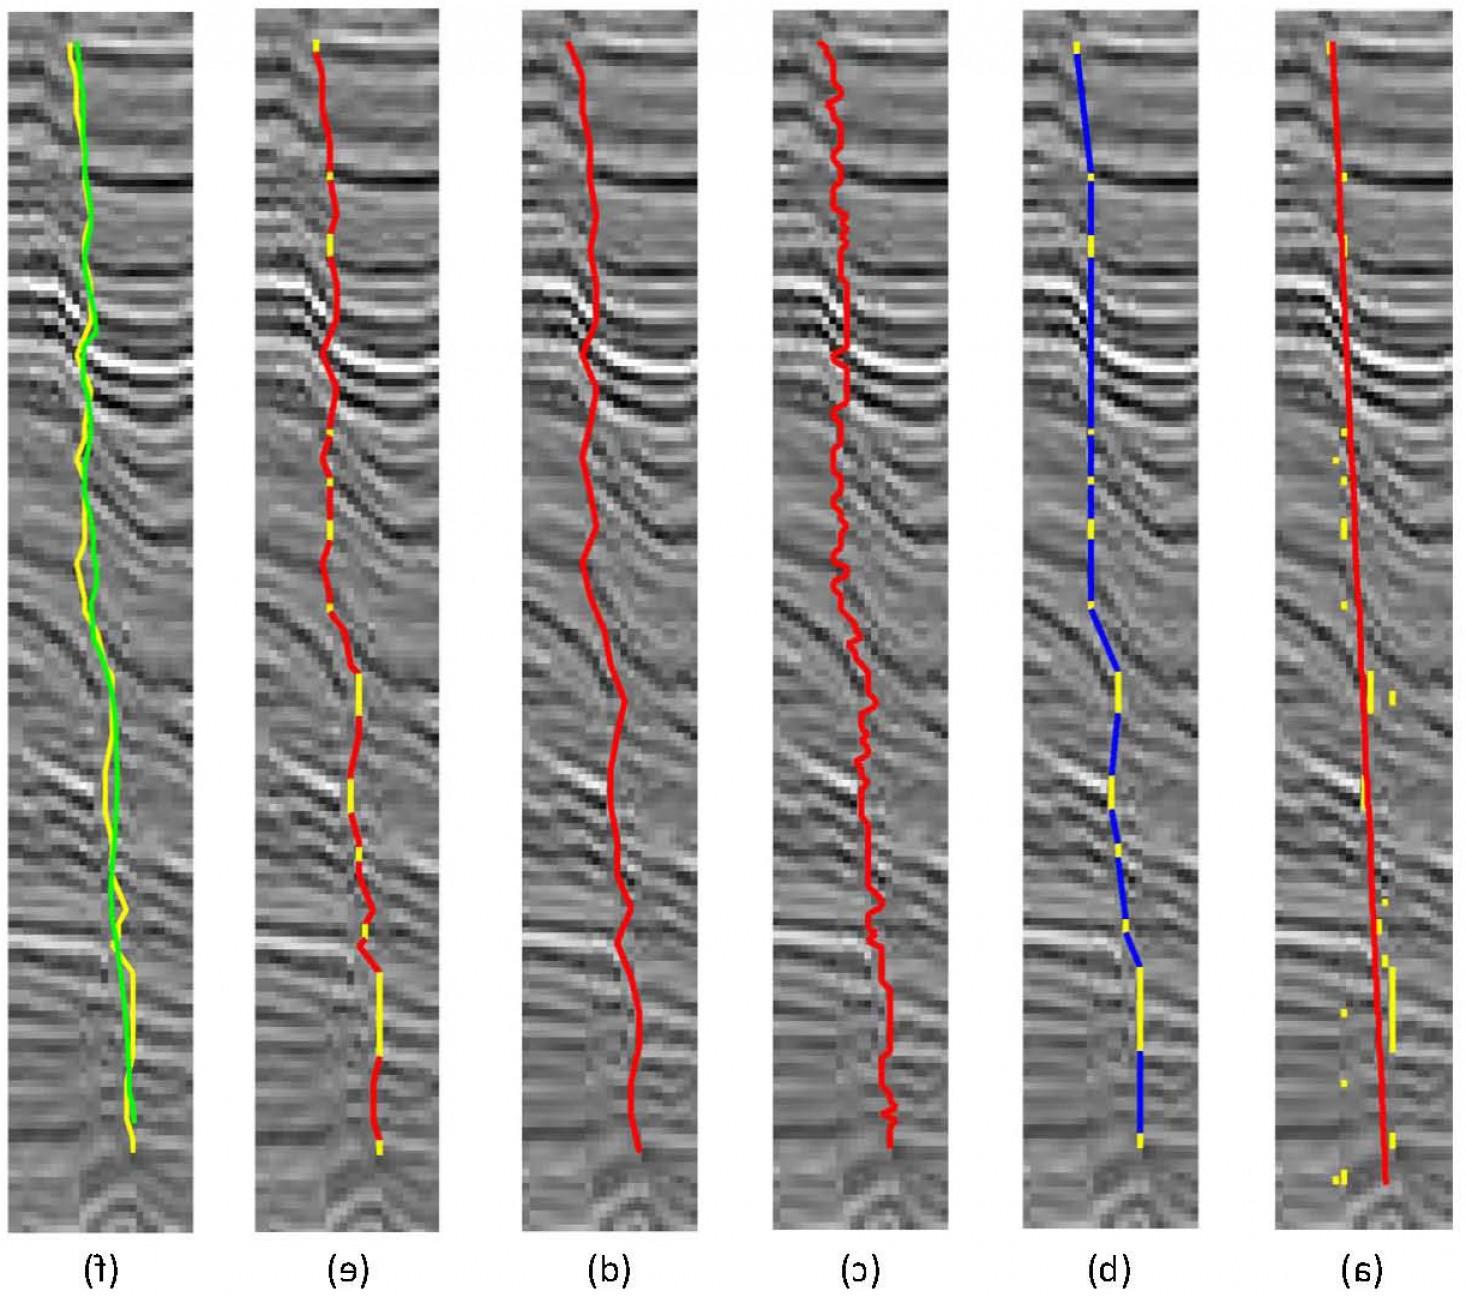 1466x1297 Fault Interpretation Using Hough Transform And Tracking Vector